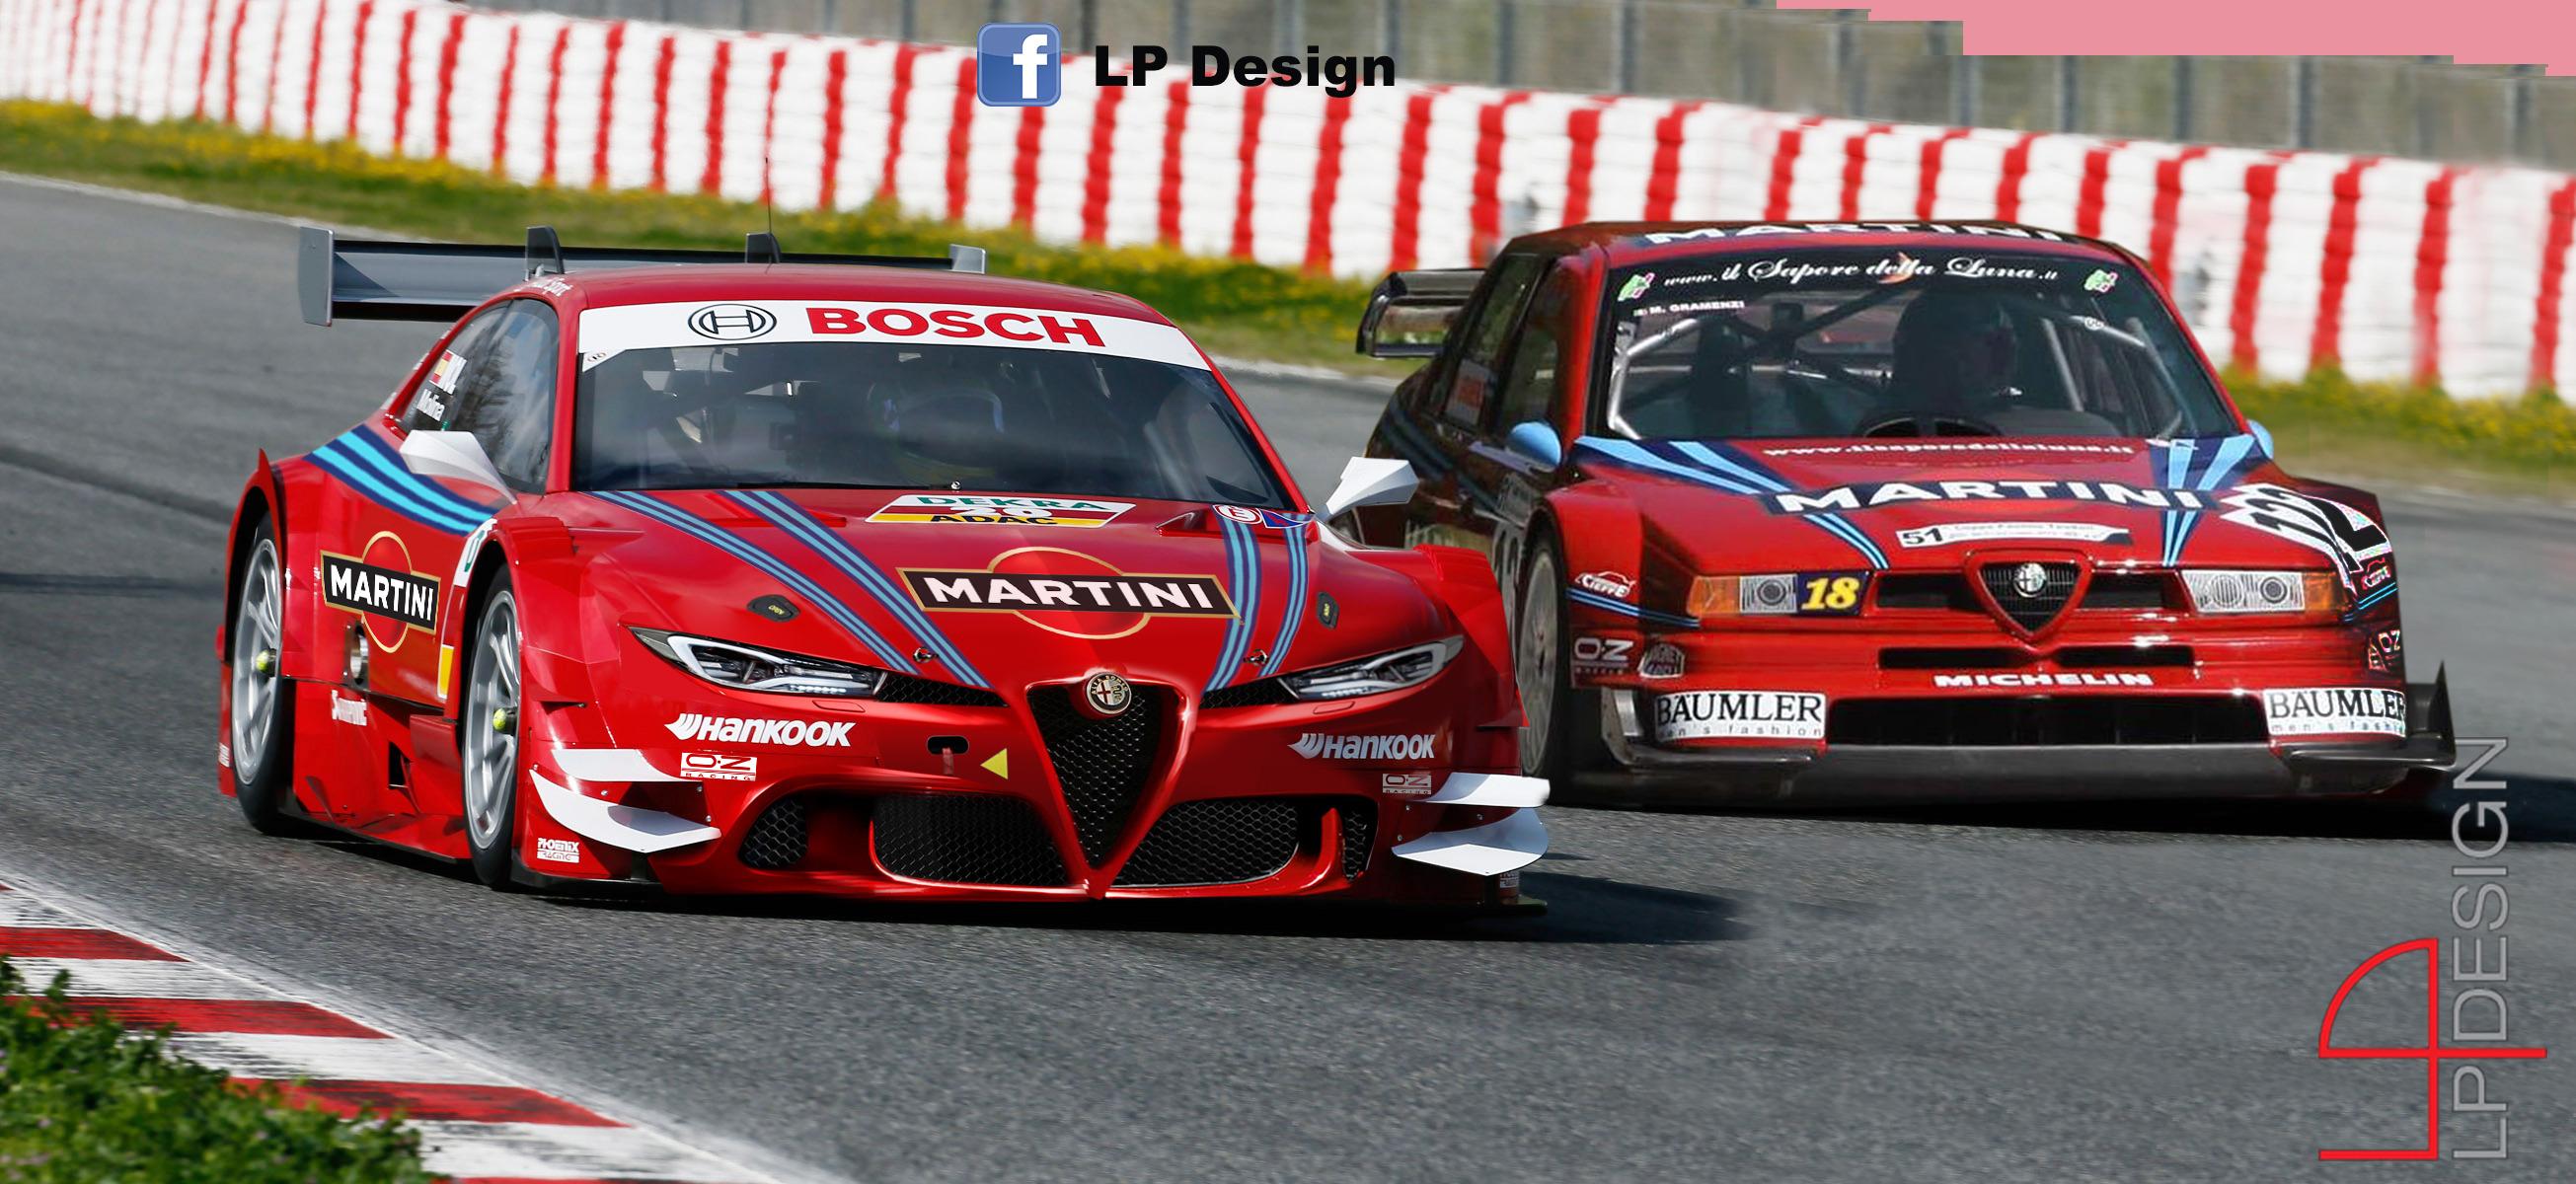 Motorsports / DTM 2013, Testfahrten Barcelona